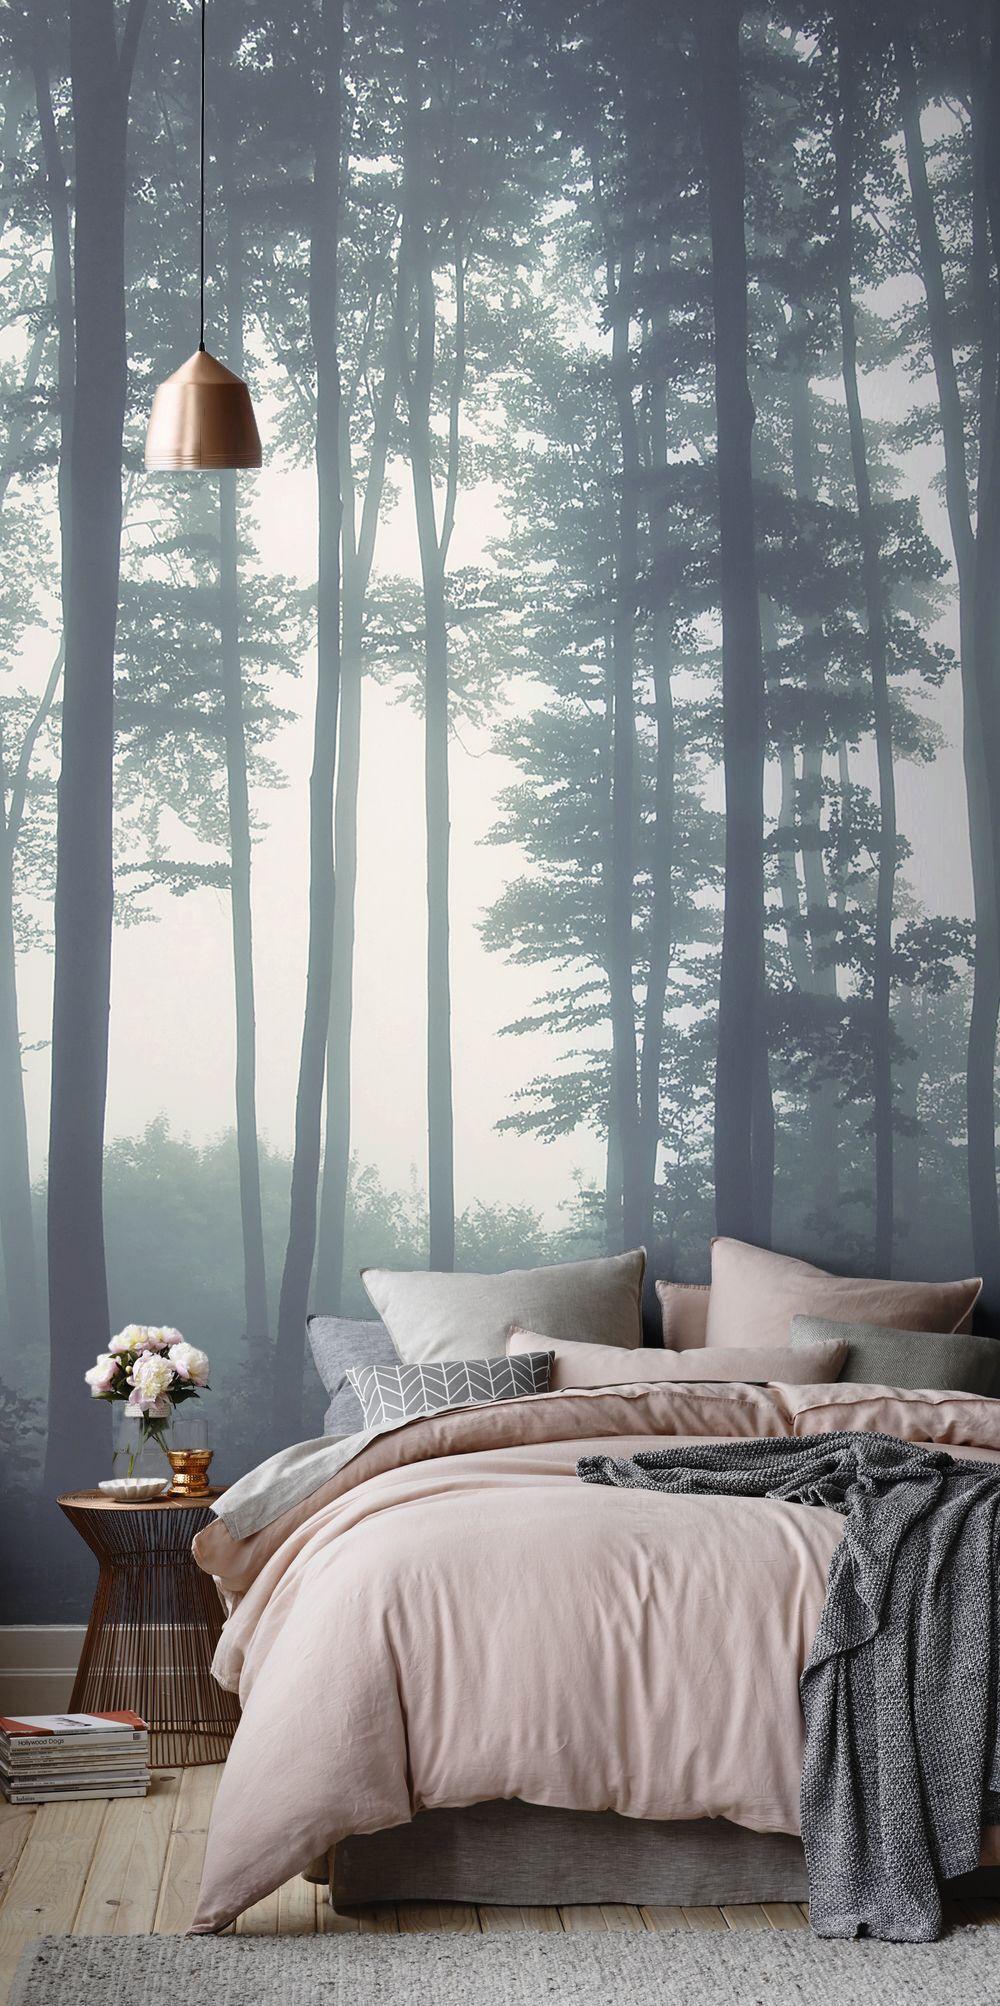 Photo of Sea of Trees Forest Mural Wallpaper | Misty Forest | MuralsWallpaper – Haus Dekoration